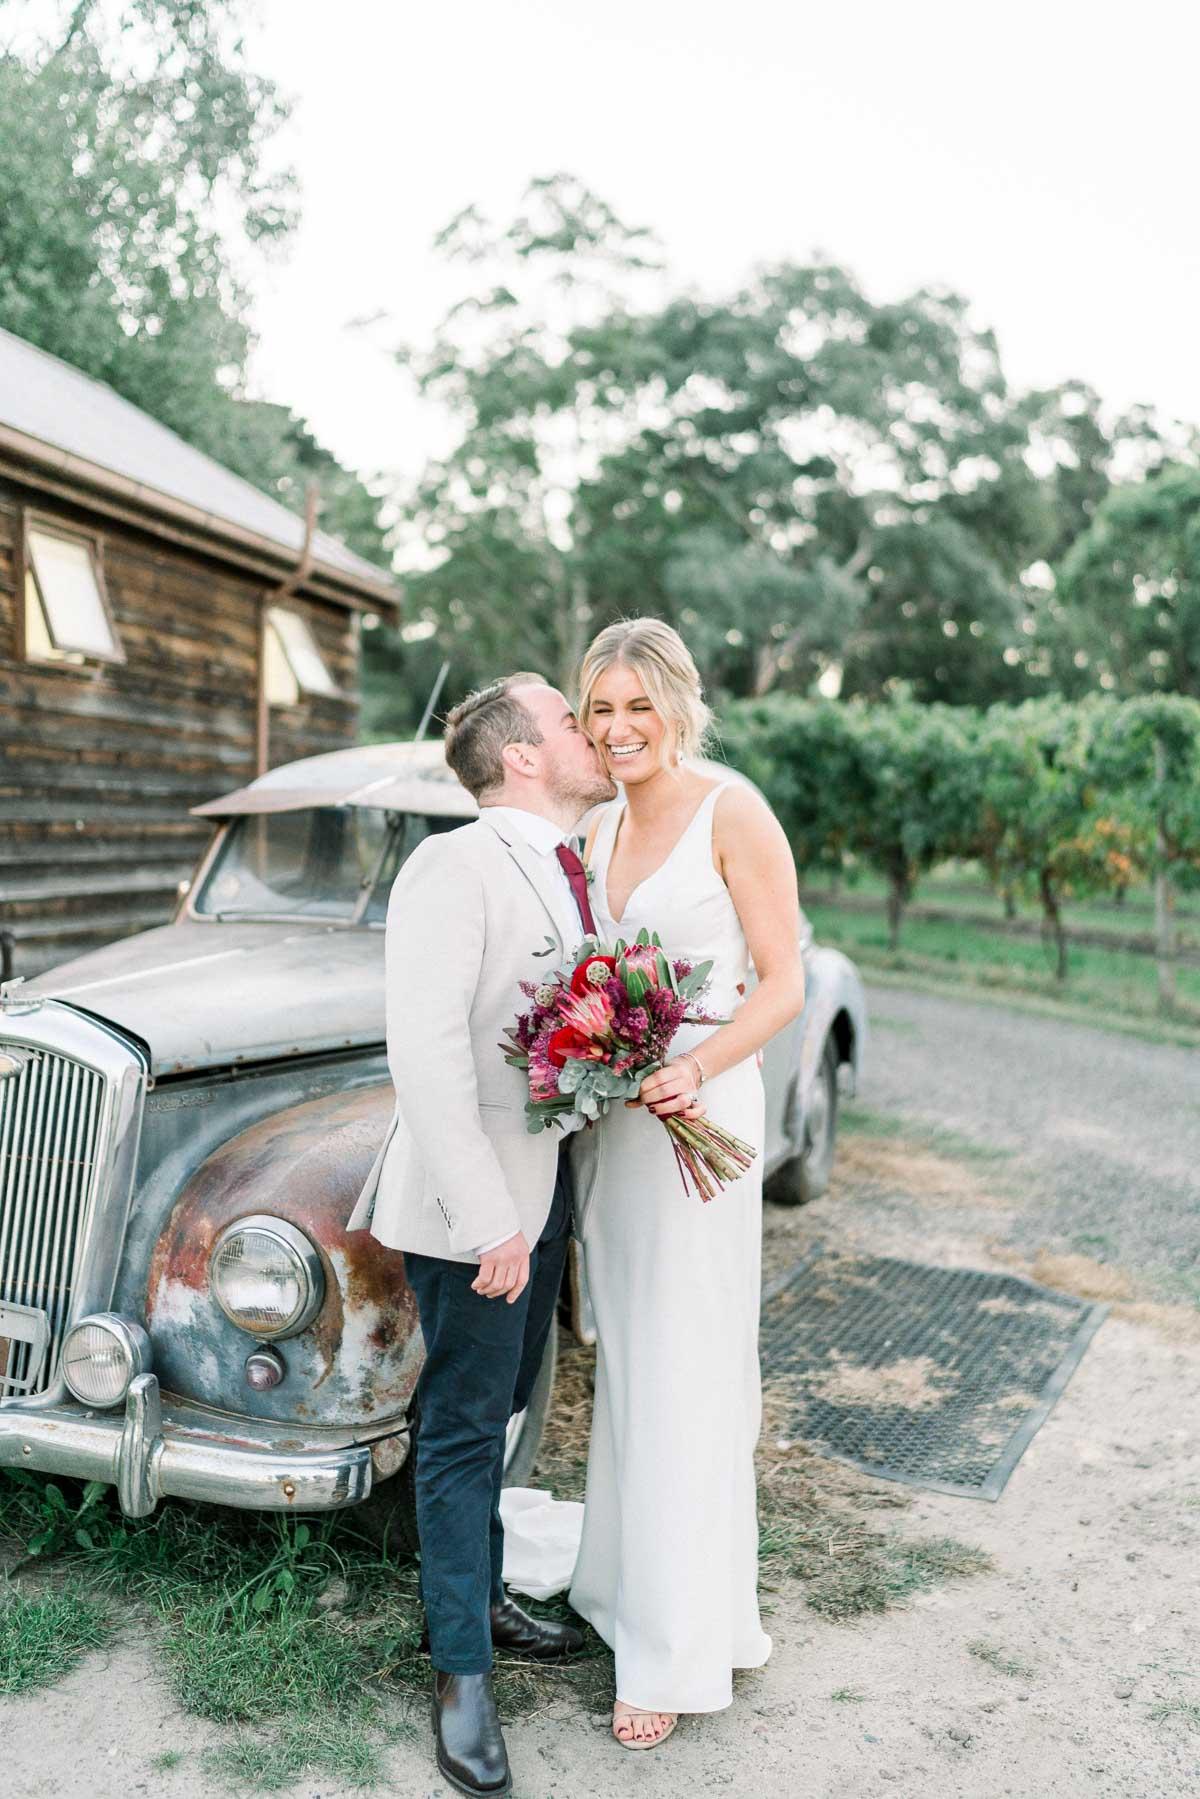 rustic-yarra-valley-wedding-venue-acacia-ridge-georgia-james-08451.jpg